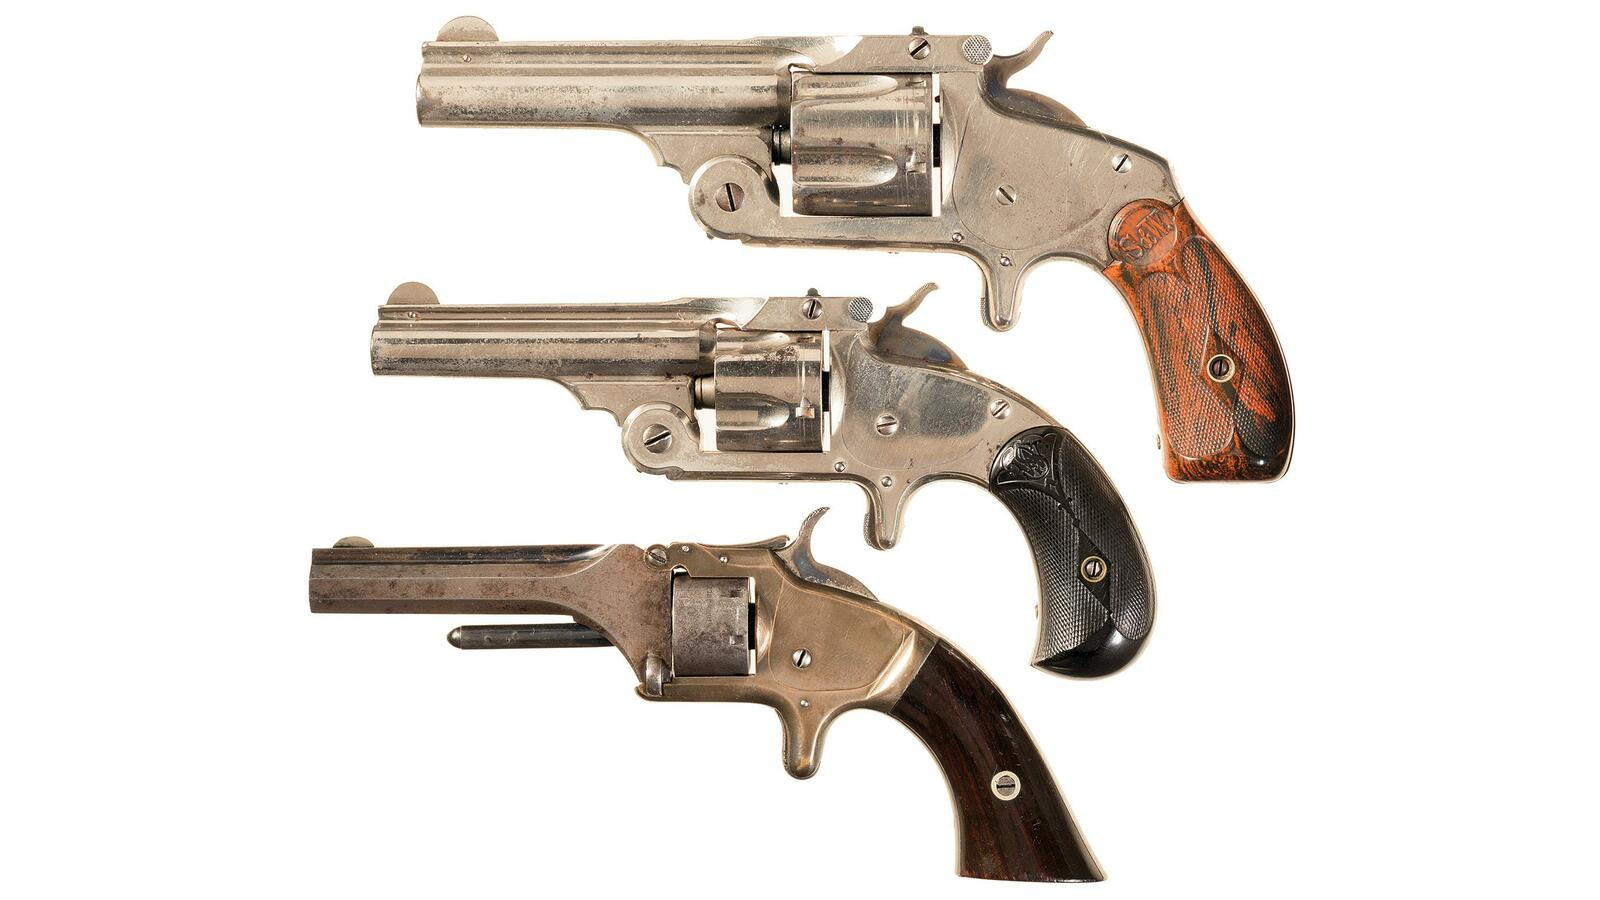 Three Smith & Wesson Revolvers